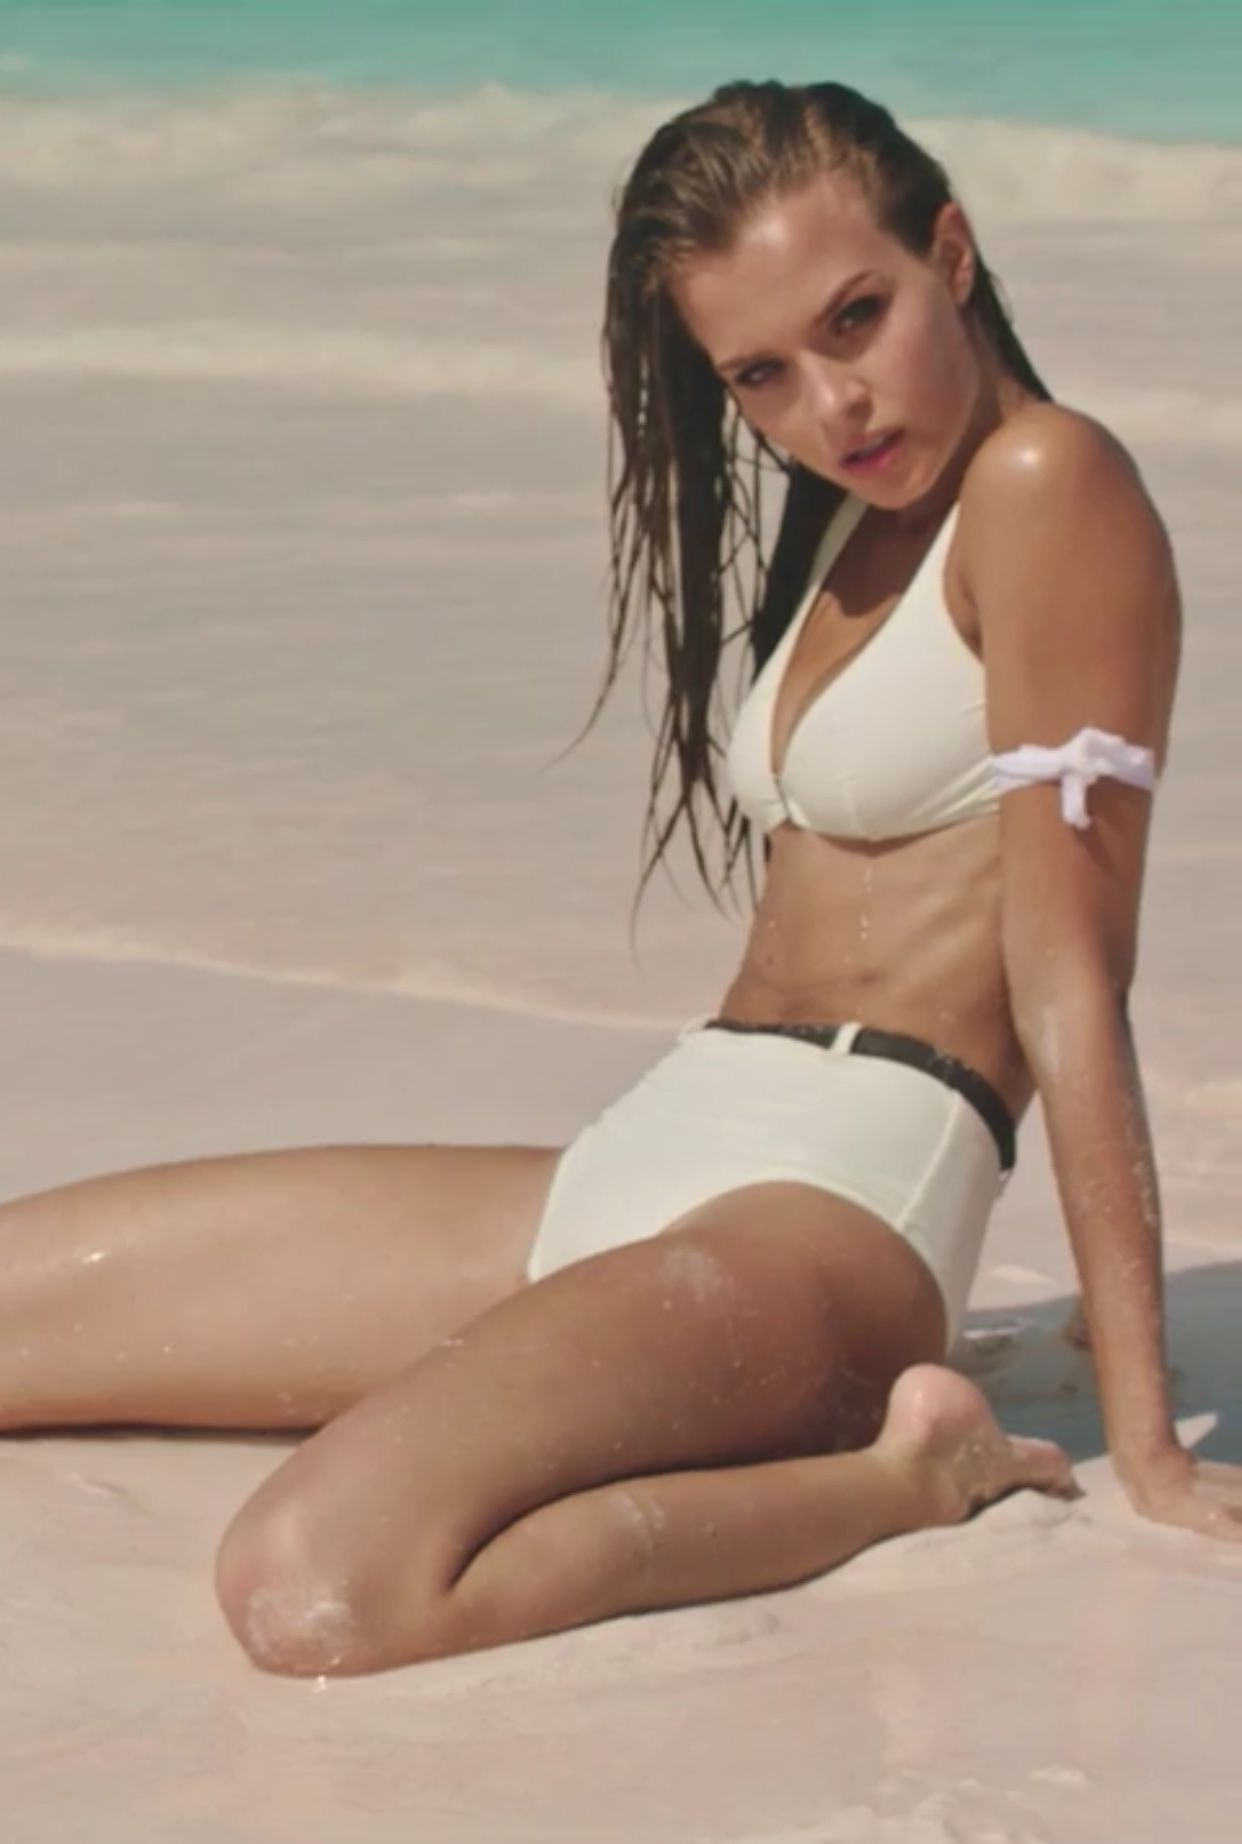 Demi rose nude snapchat leaked pics foto